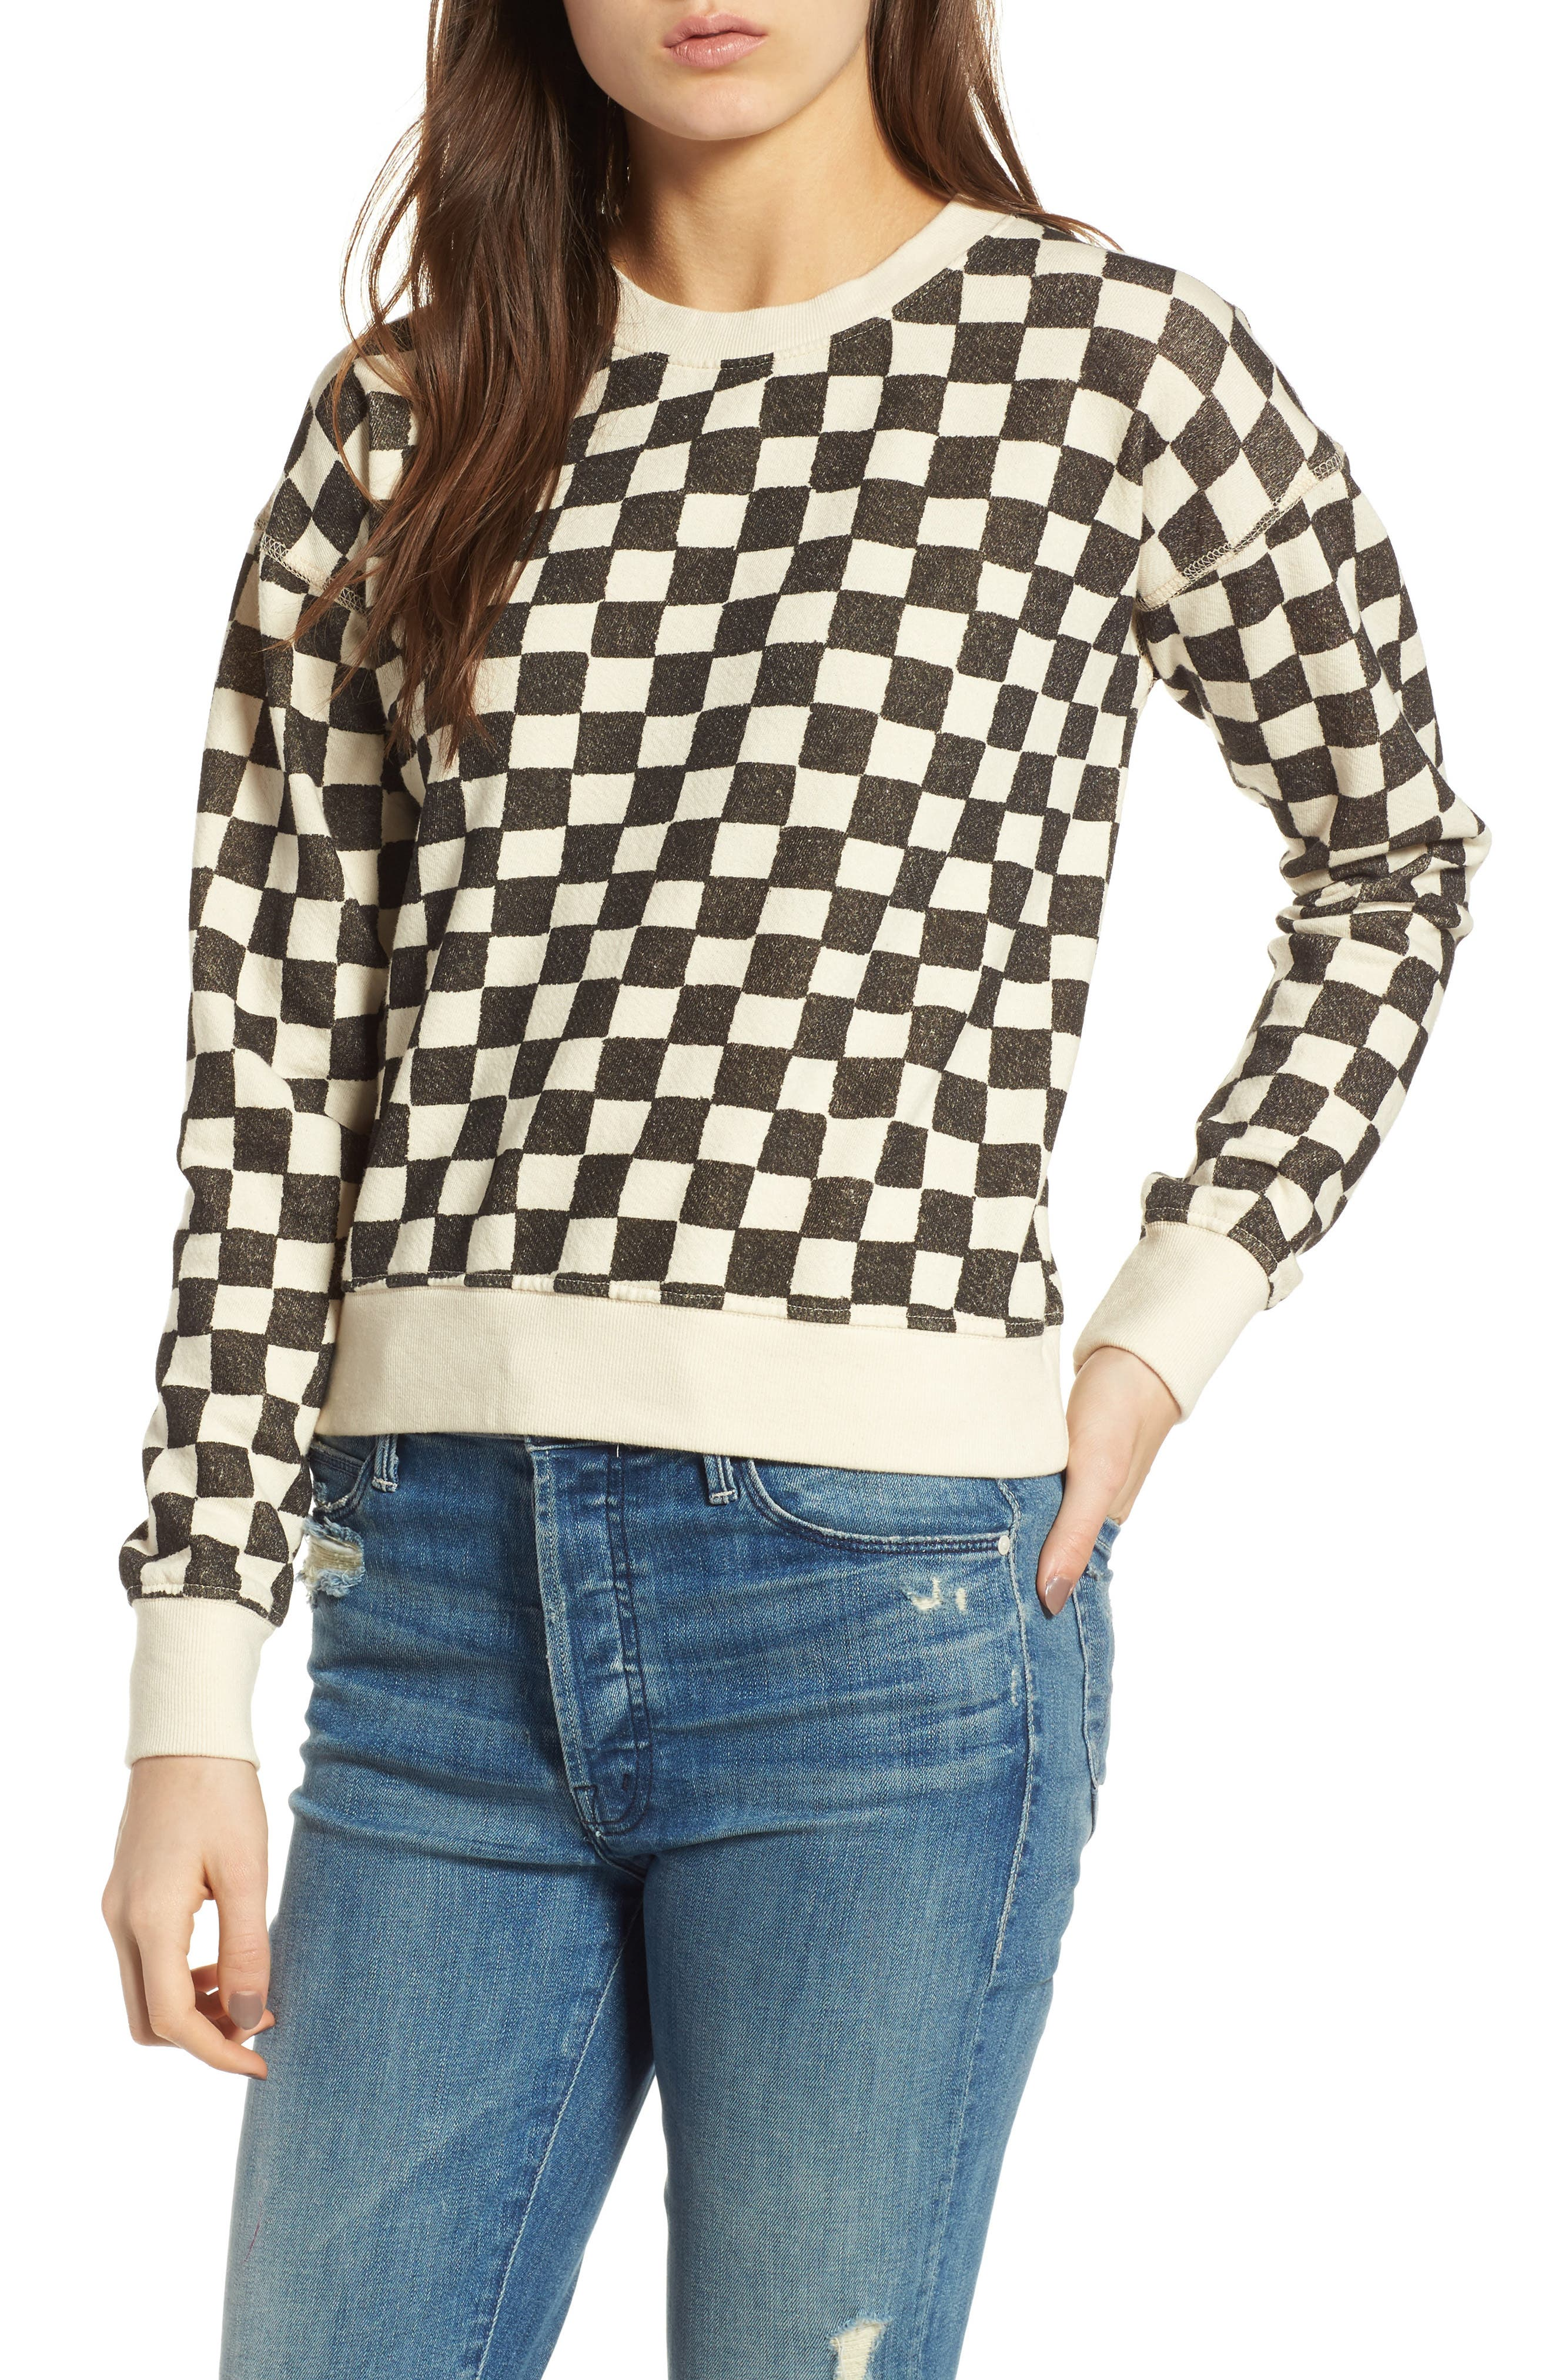 Alternate Image 1 Selected - MOTHER The Shrunken Sweater